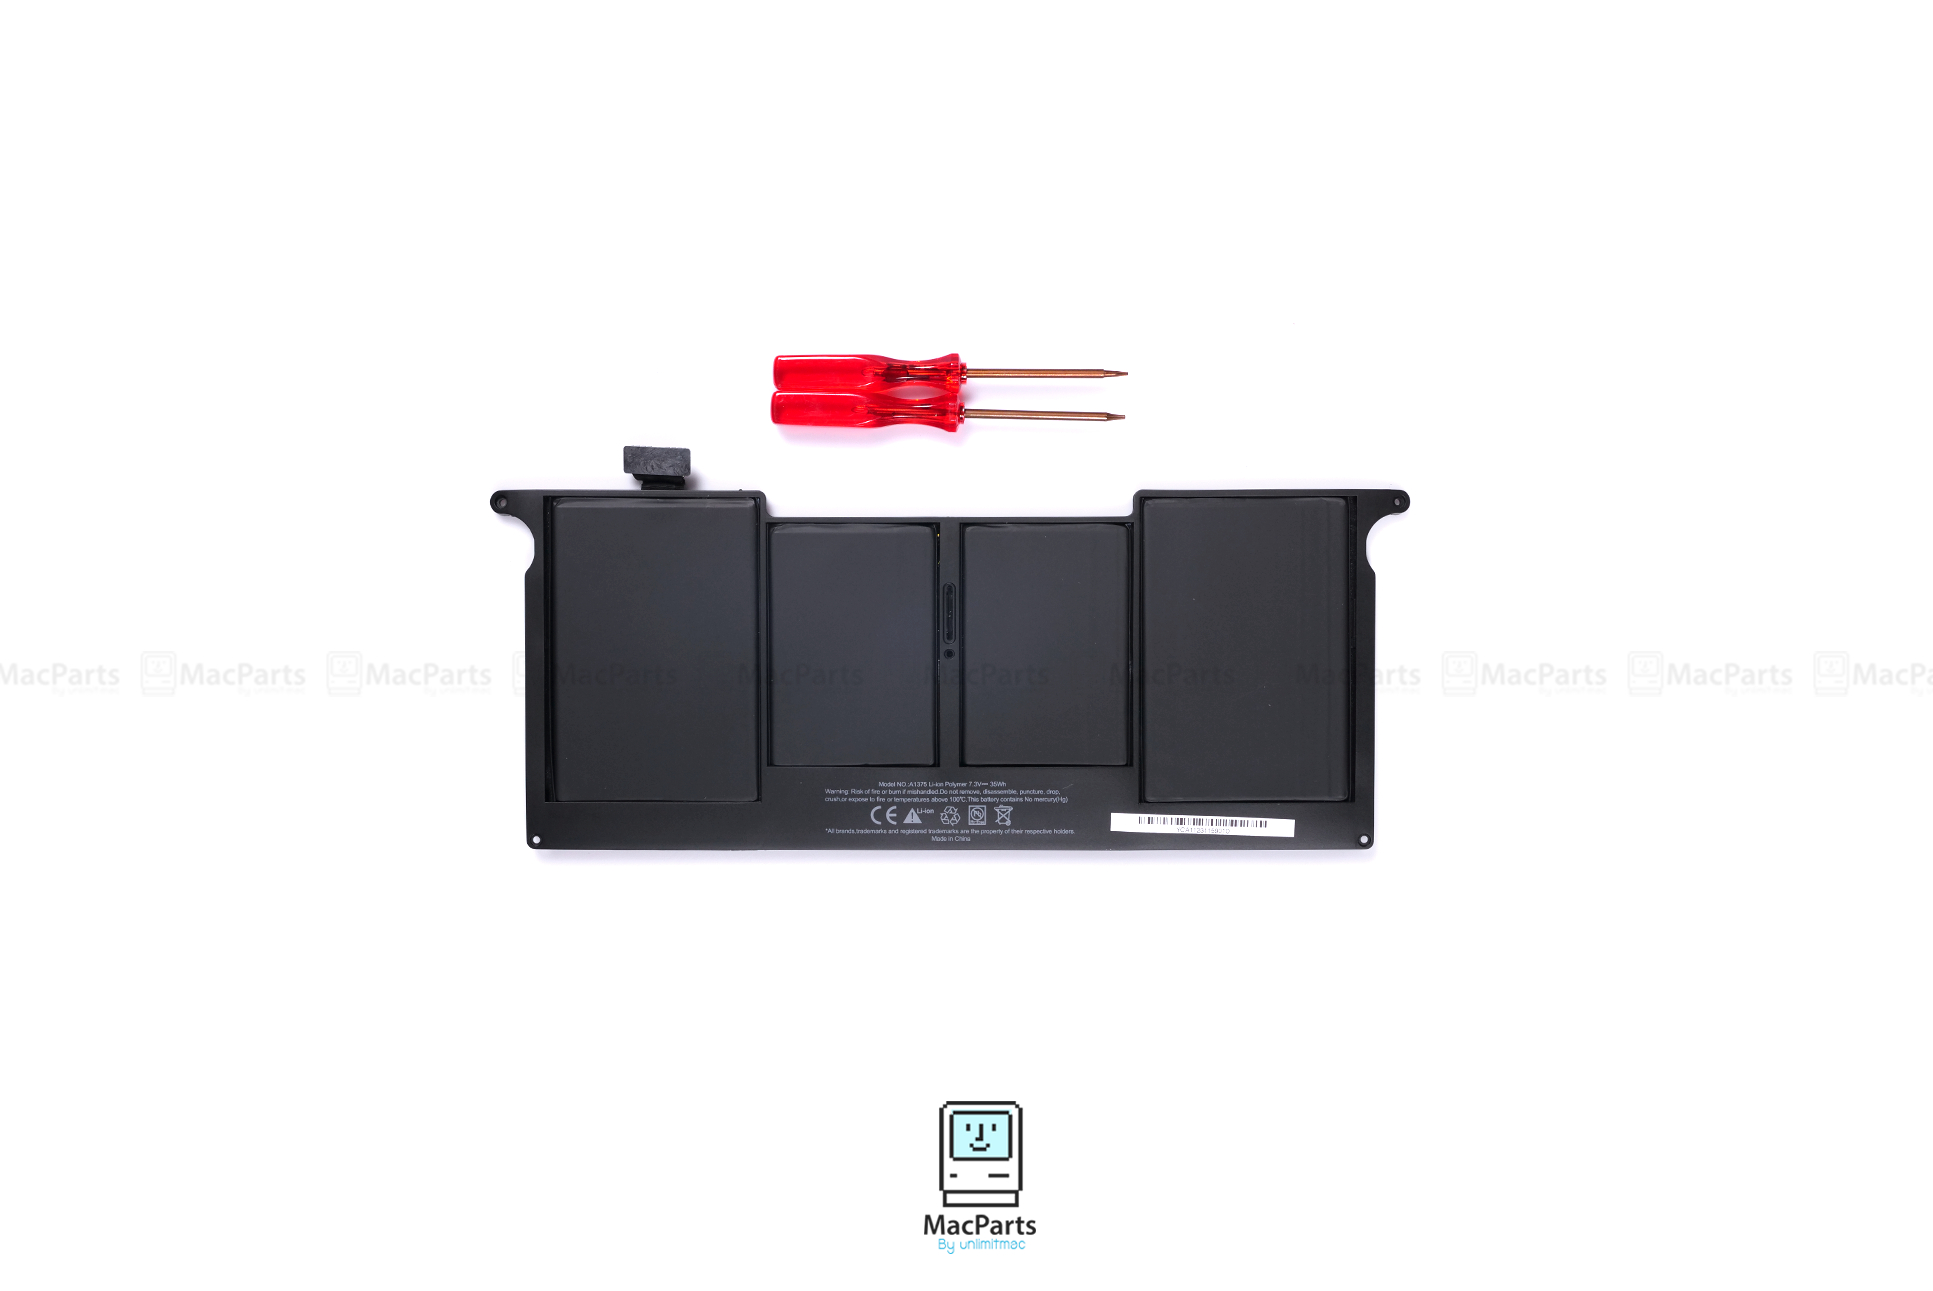 FE661-5736 OEM Battery For -11-inch MacBook Air Late 2010 OEM